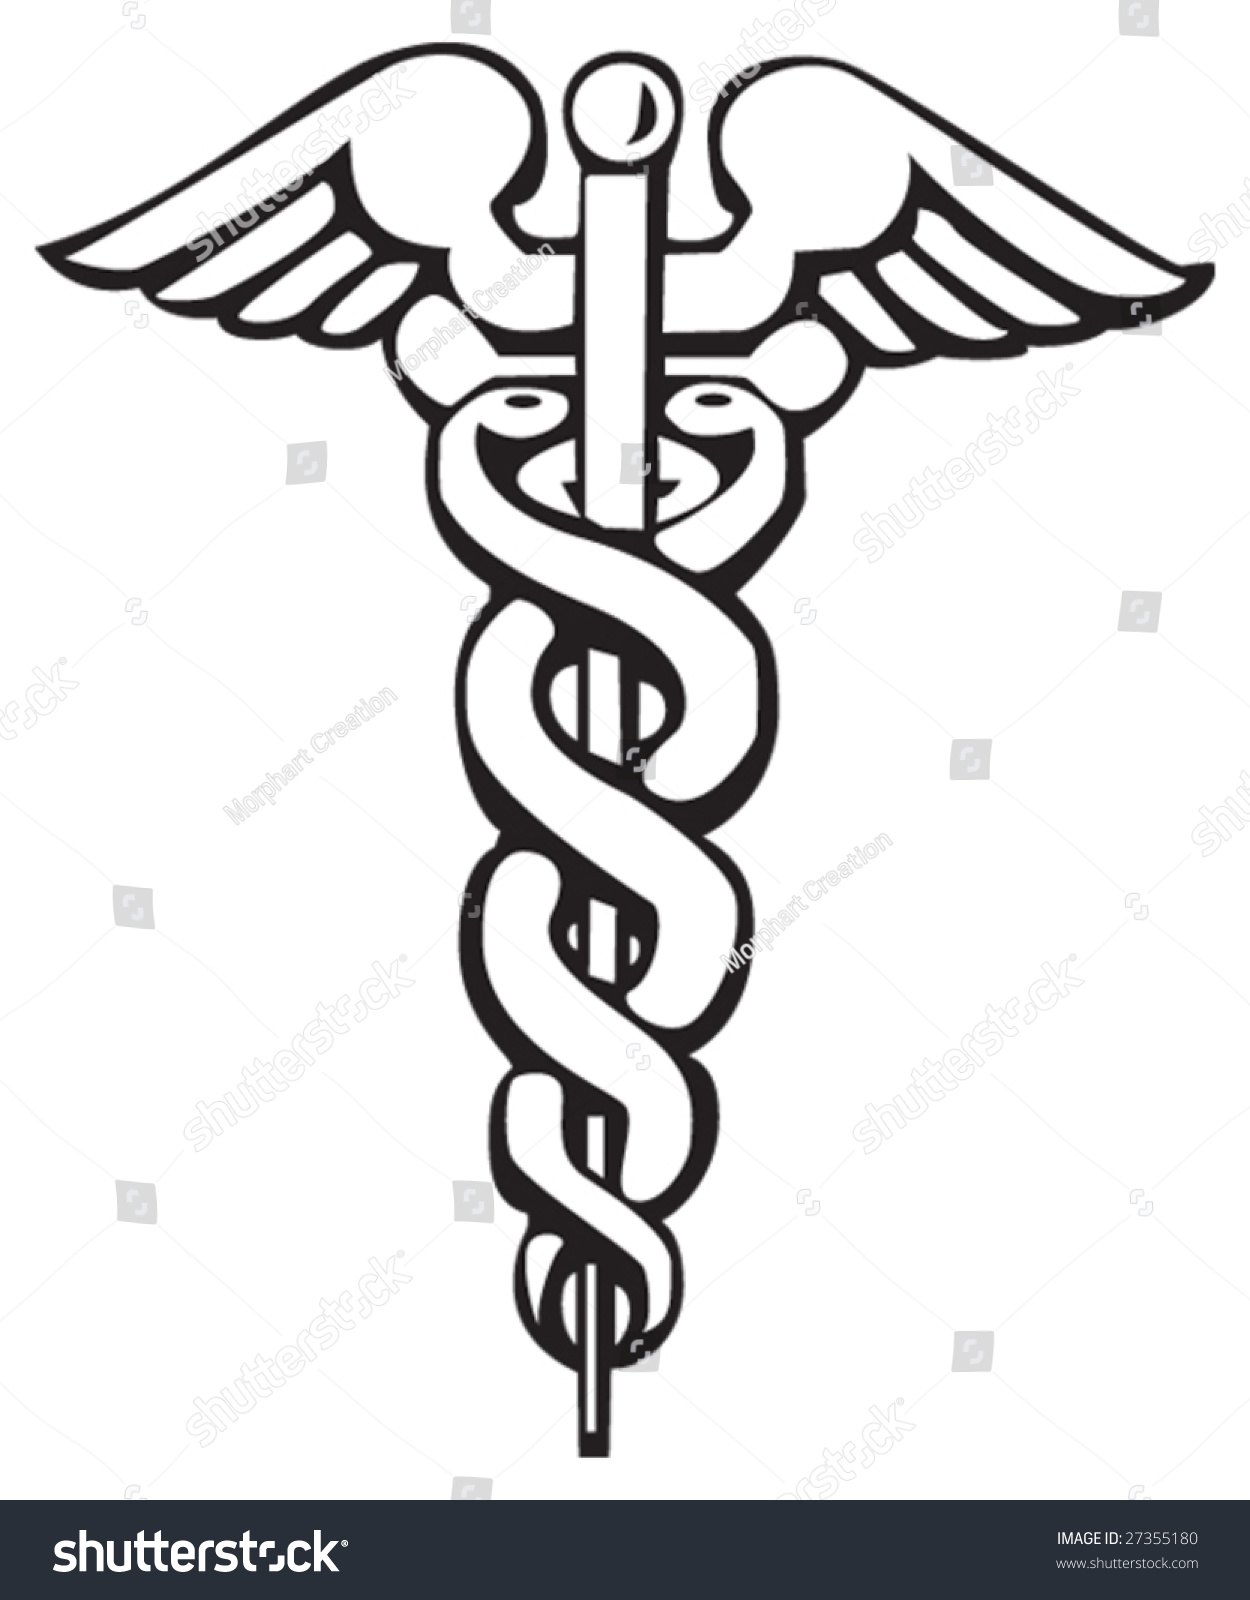 Caduceus Greek Sign Symbol Tattoo Artwork Stock Vector Royalty Free